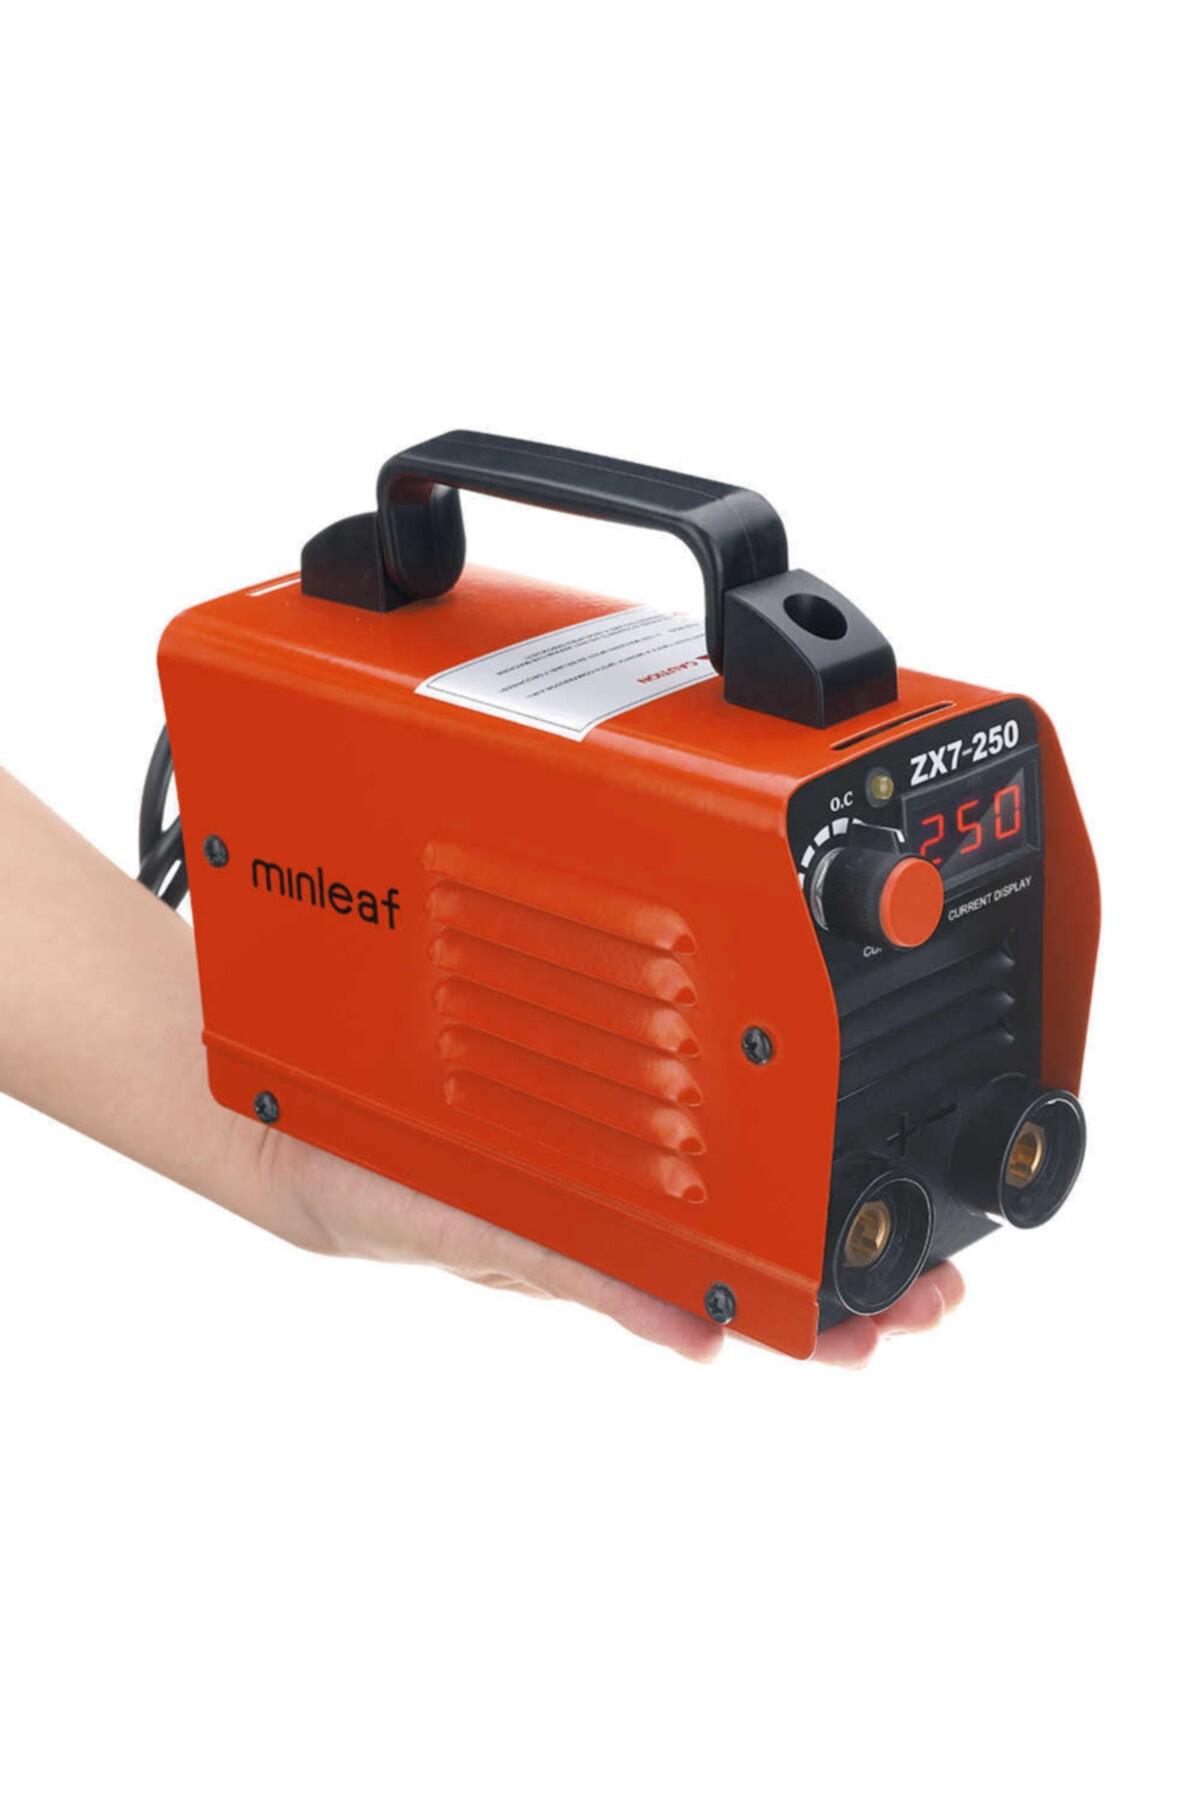 SNOOPY 250a Mini Elektrikli Kaynak Makinesi Taşınabilir Dijital Ekran 1